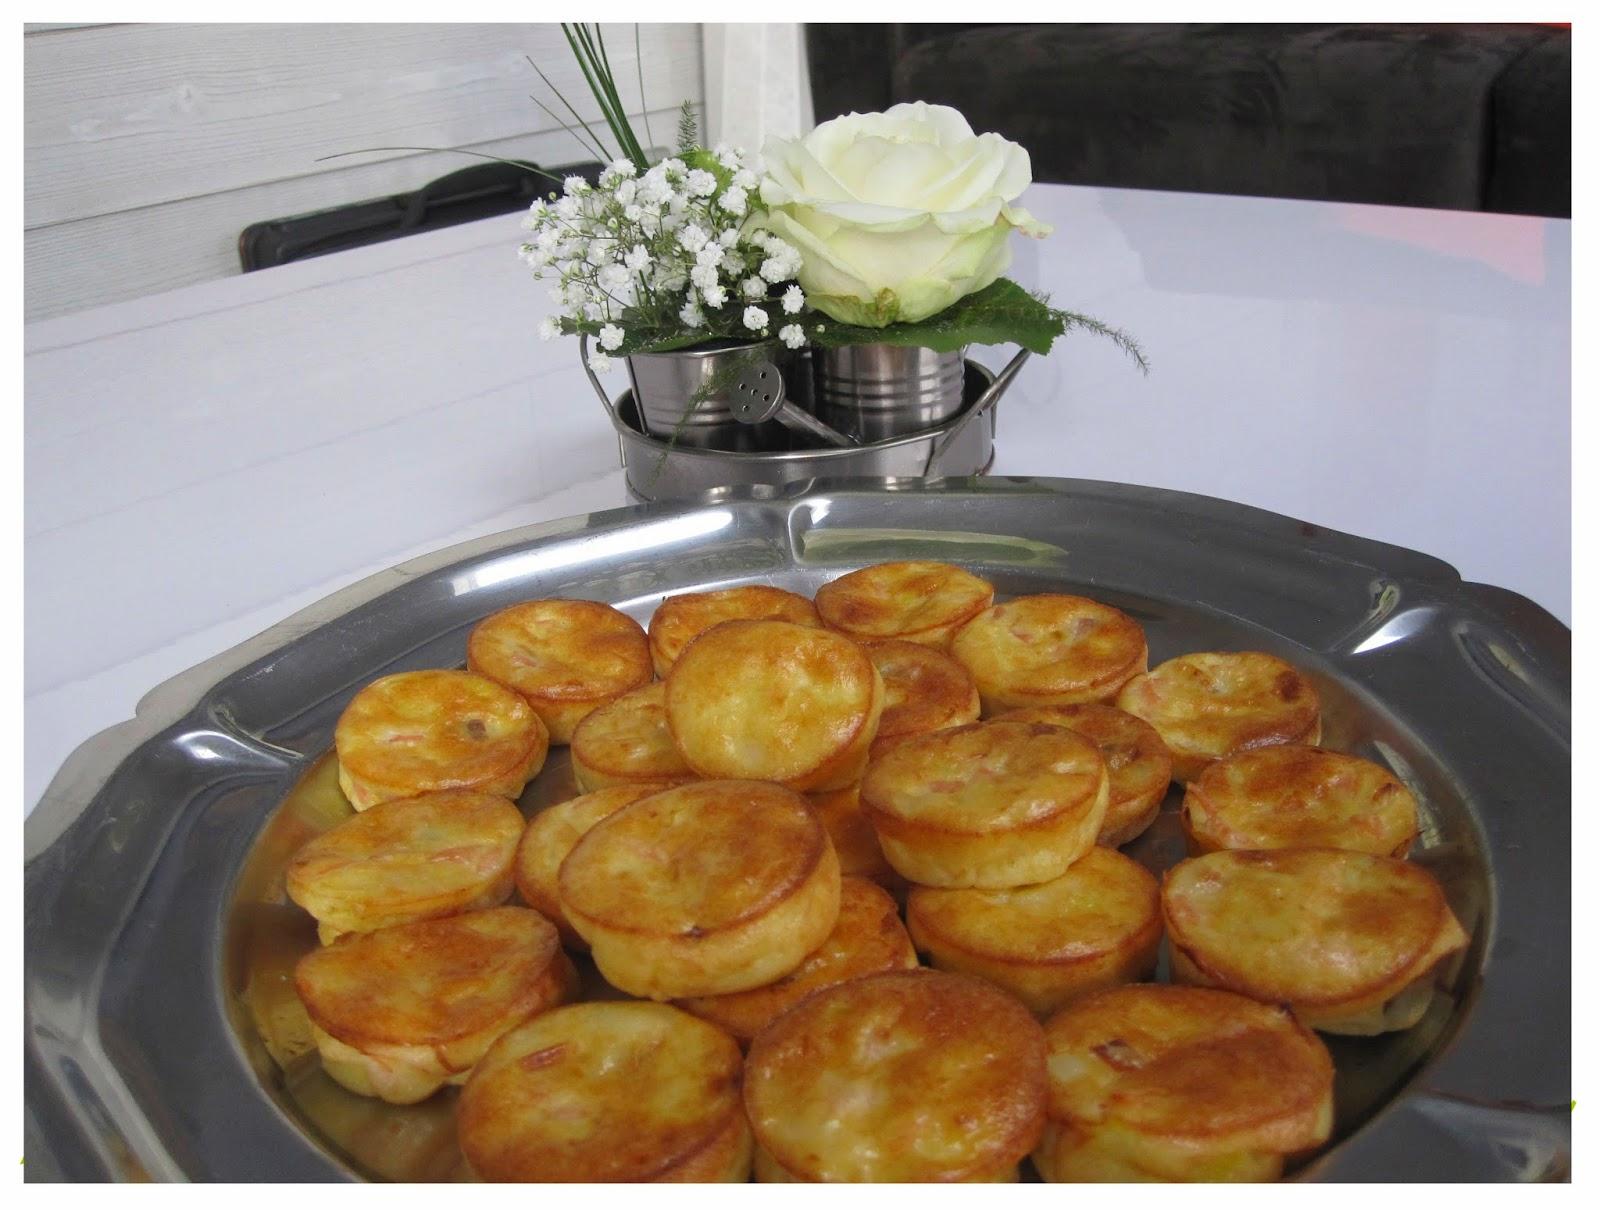 http://fleurdeseletcaramel.blogspot.fr/2013/01/bouchees-aperitives-saumon-fume-poireaux.html